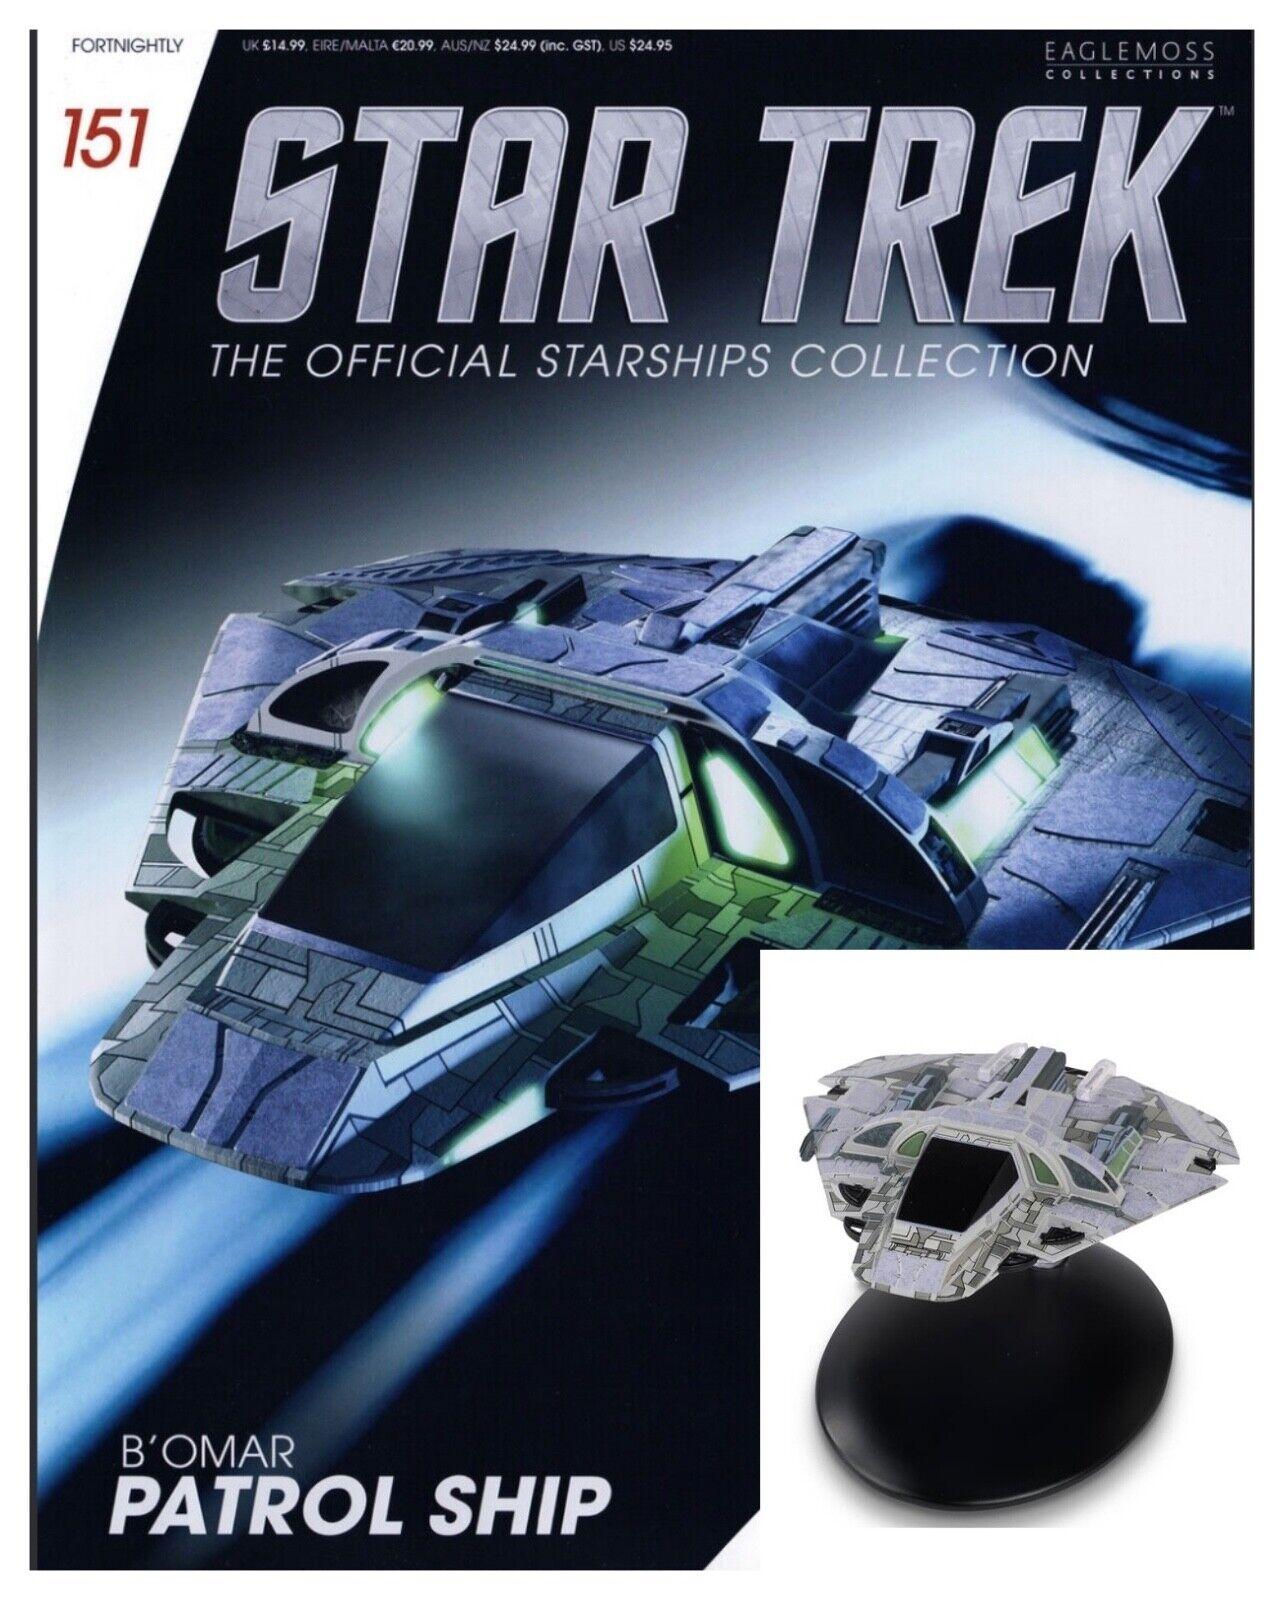 Issue 151: B'omar Patrol Starship